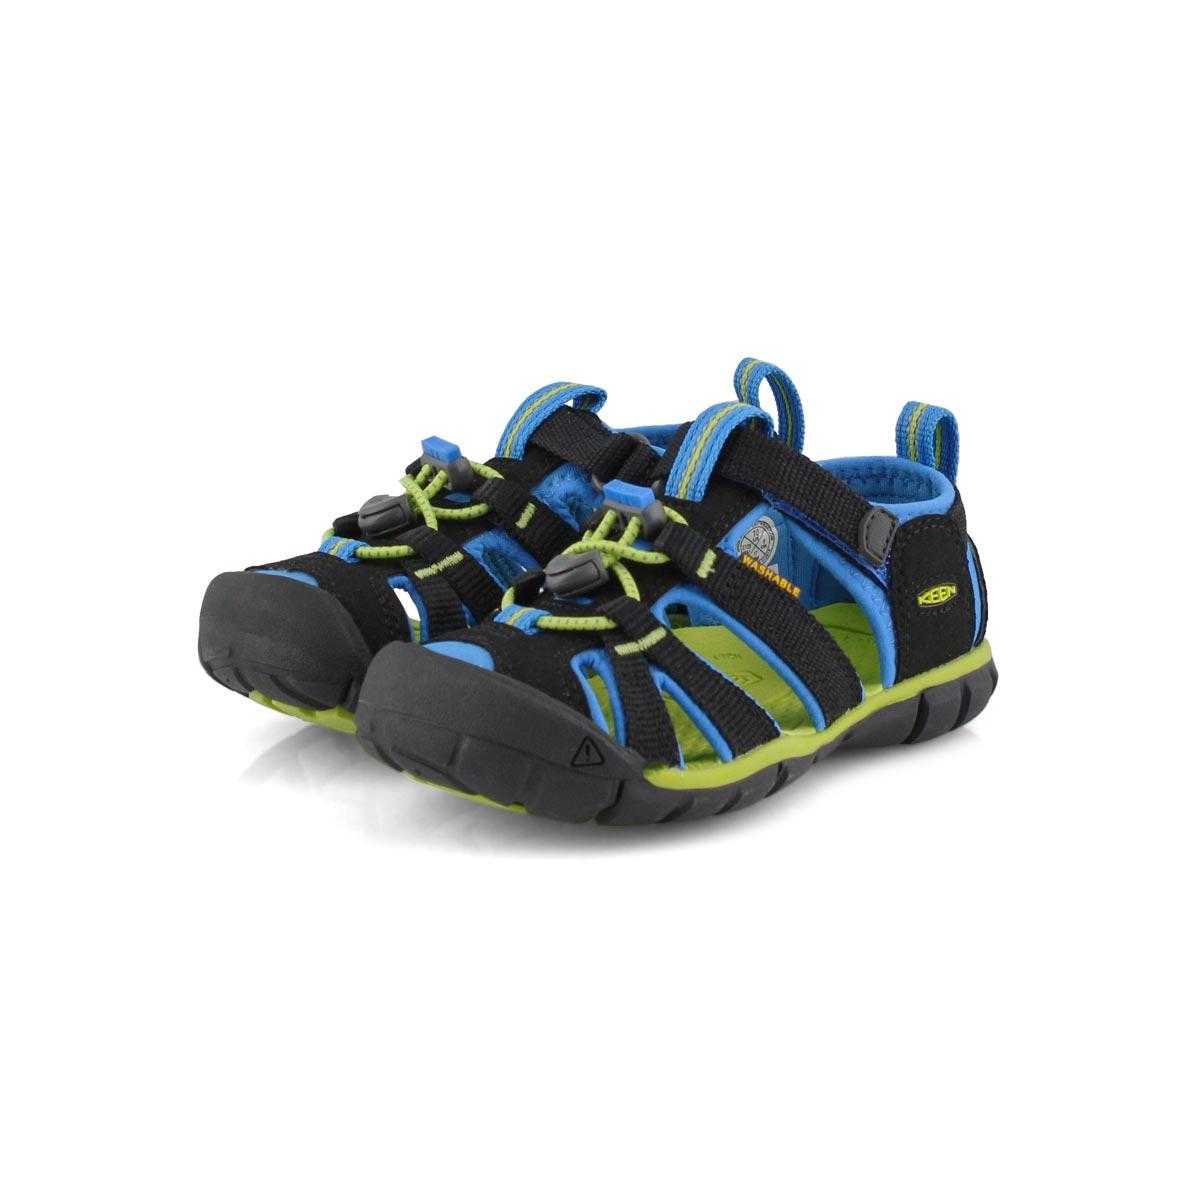 Infs-b Seacamp II CNX blk/blu sport sndl